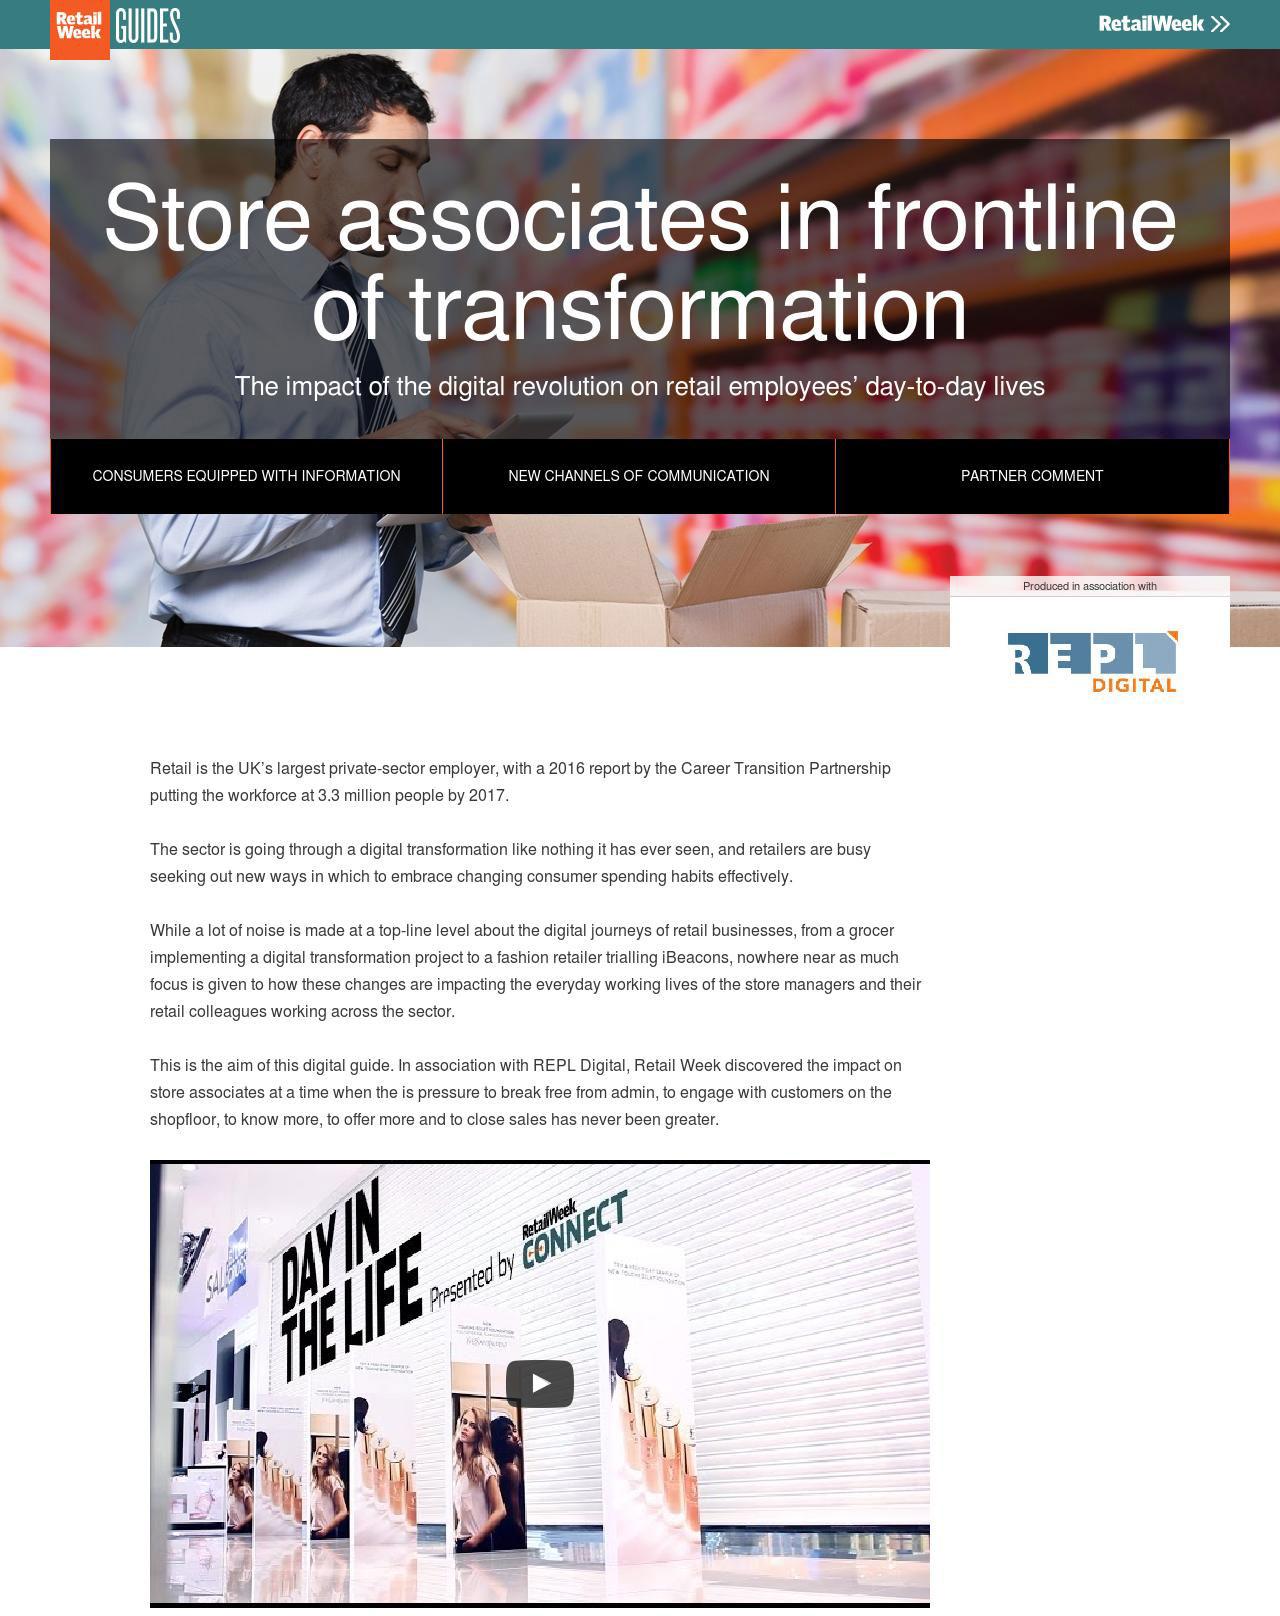 Store associates